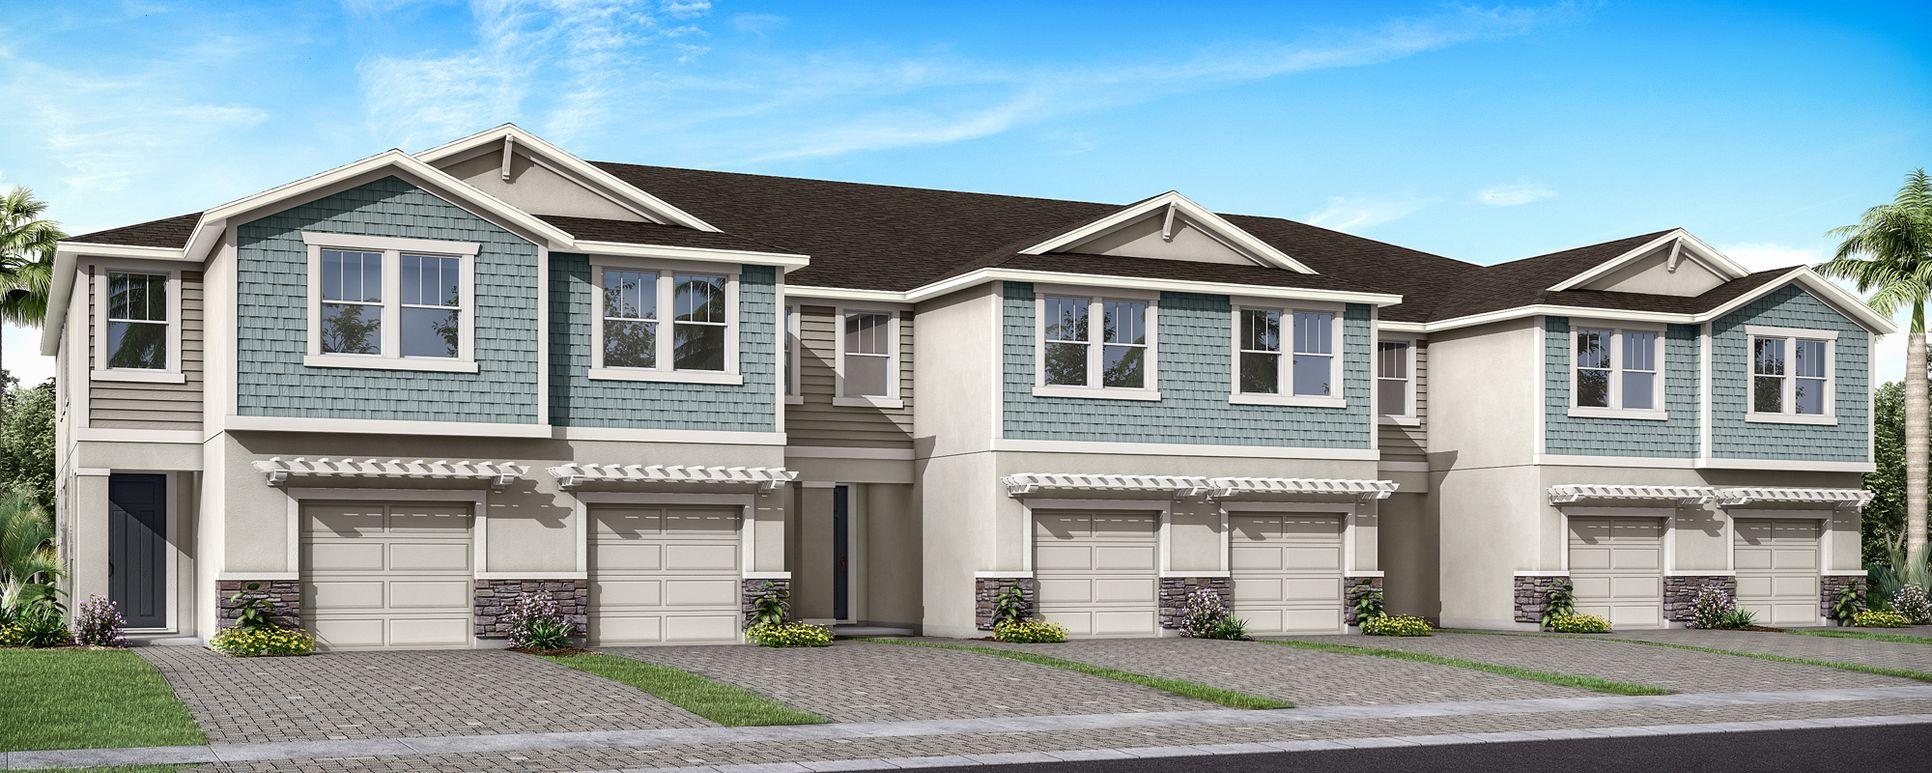 Citrus Park - Citron Grove:Stylish townhomes (rendering shown)